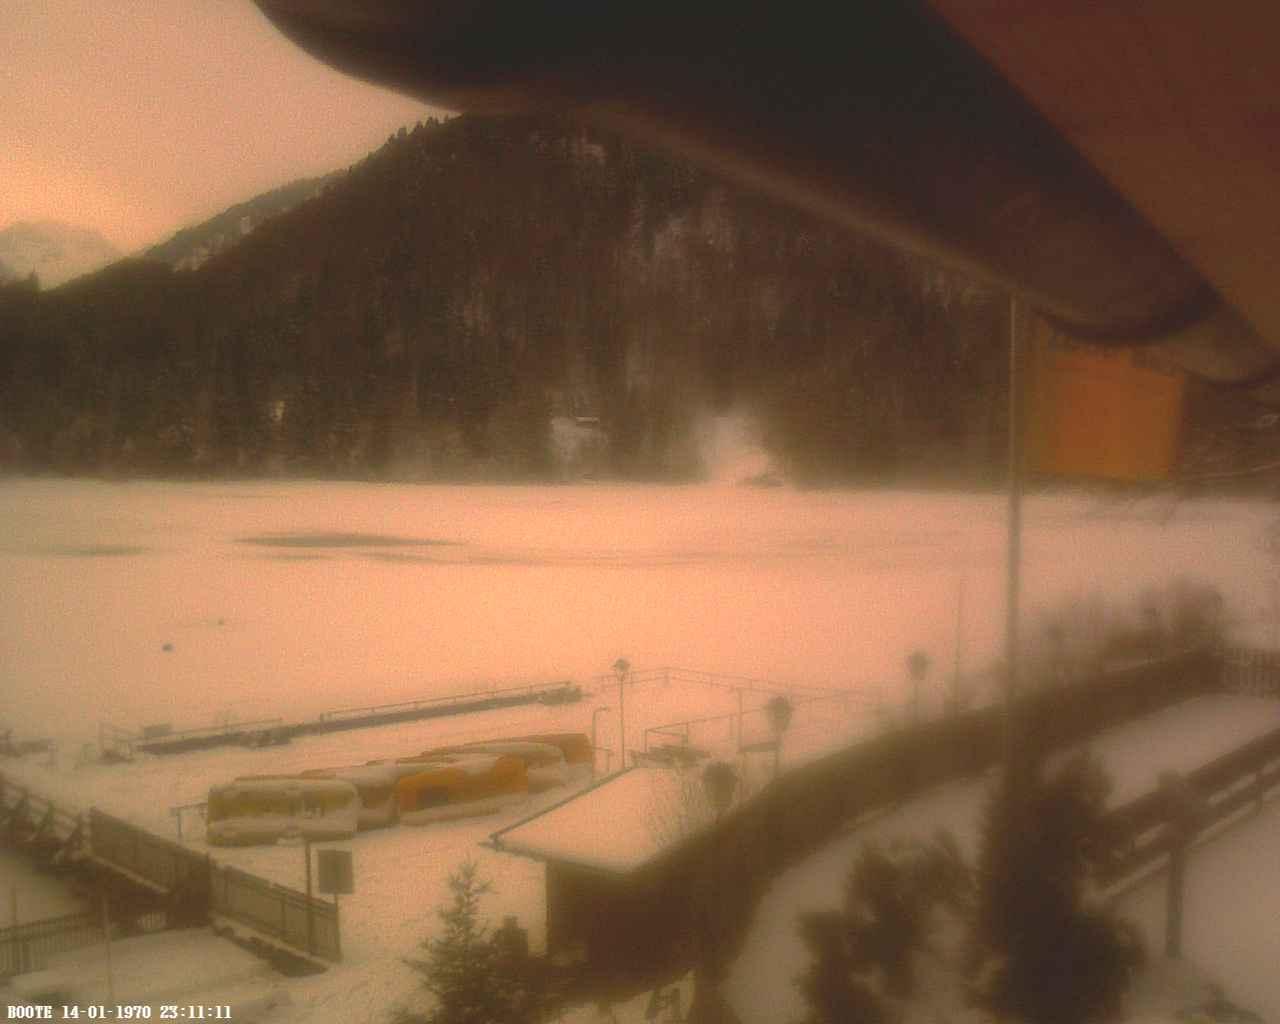 Webcam Allgäu - Oberstdorf - Webcam vom Naturfreibad Freibergsee